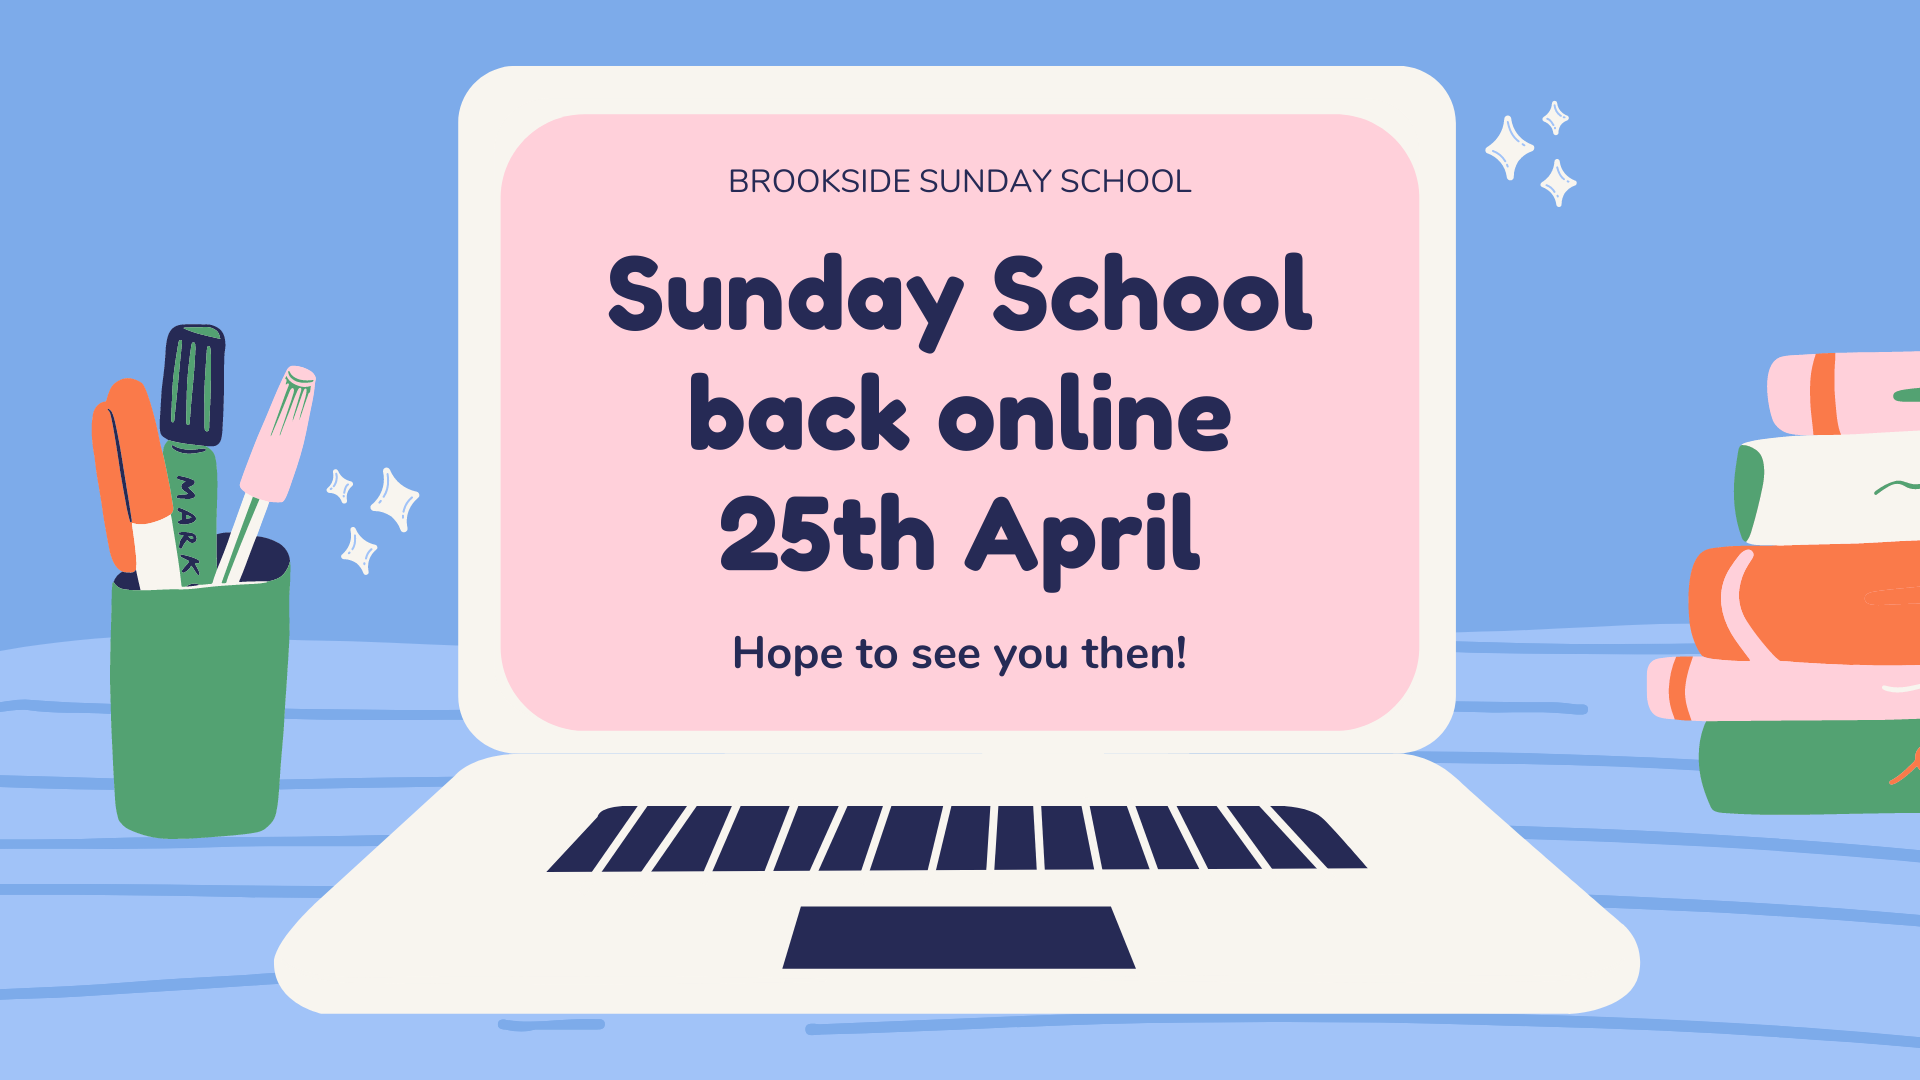 Sunday School back online 25th April